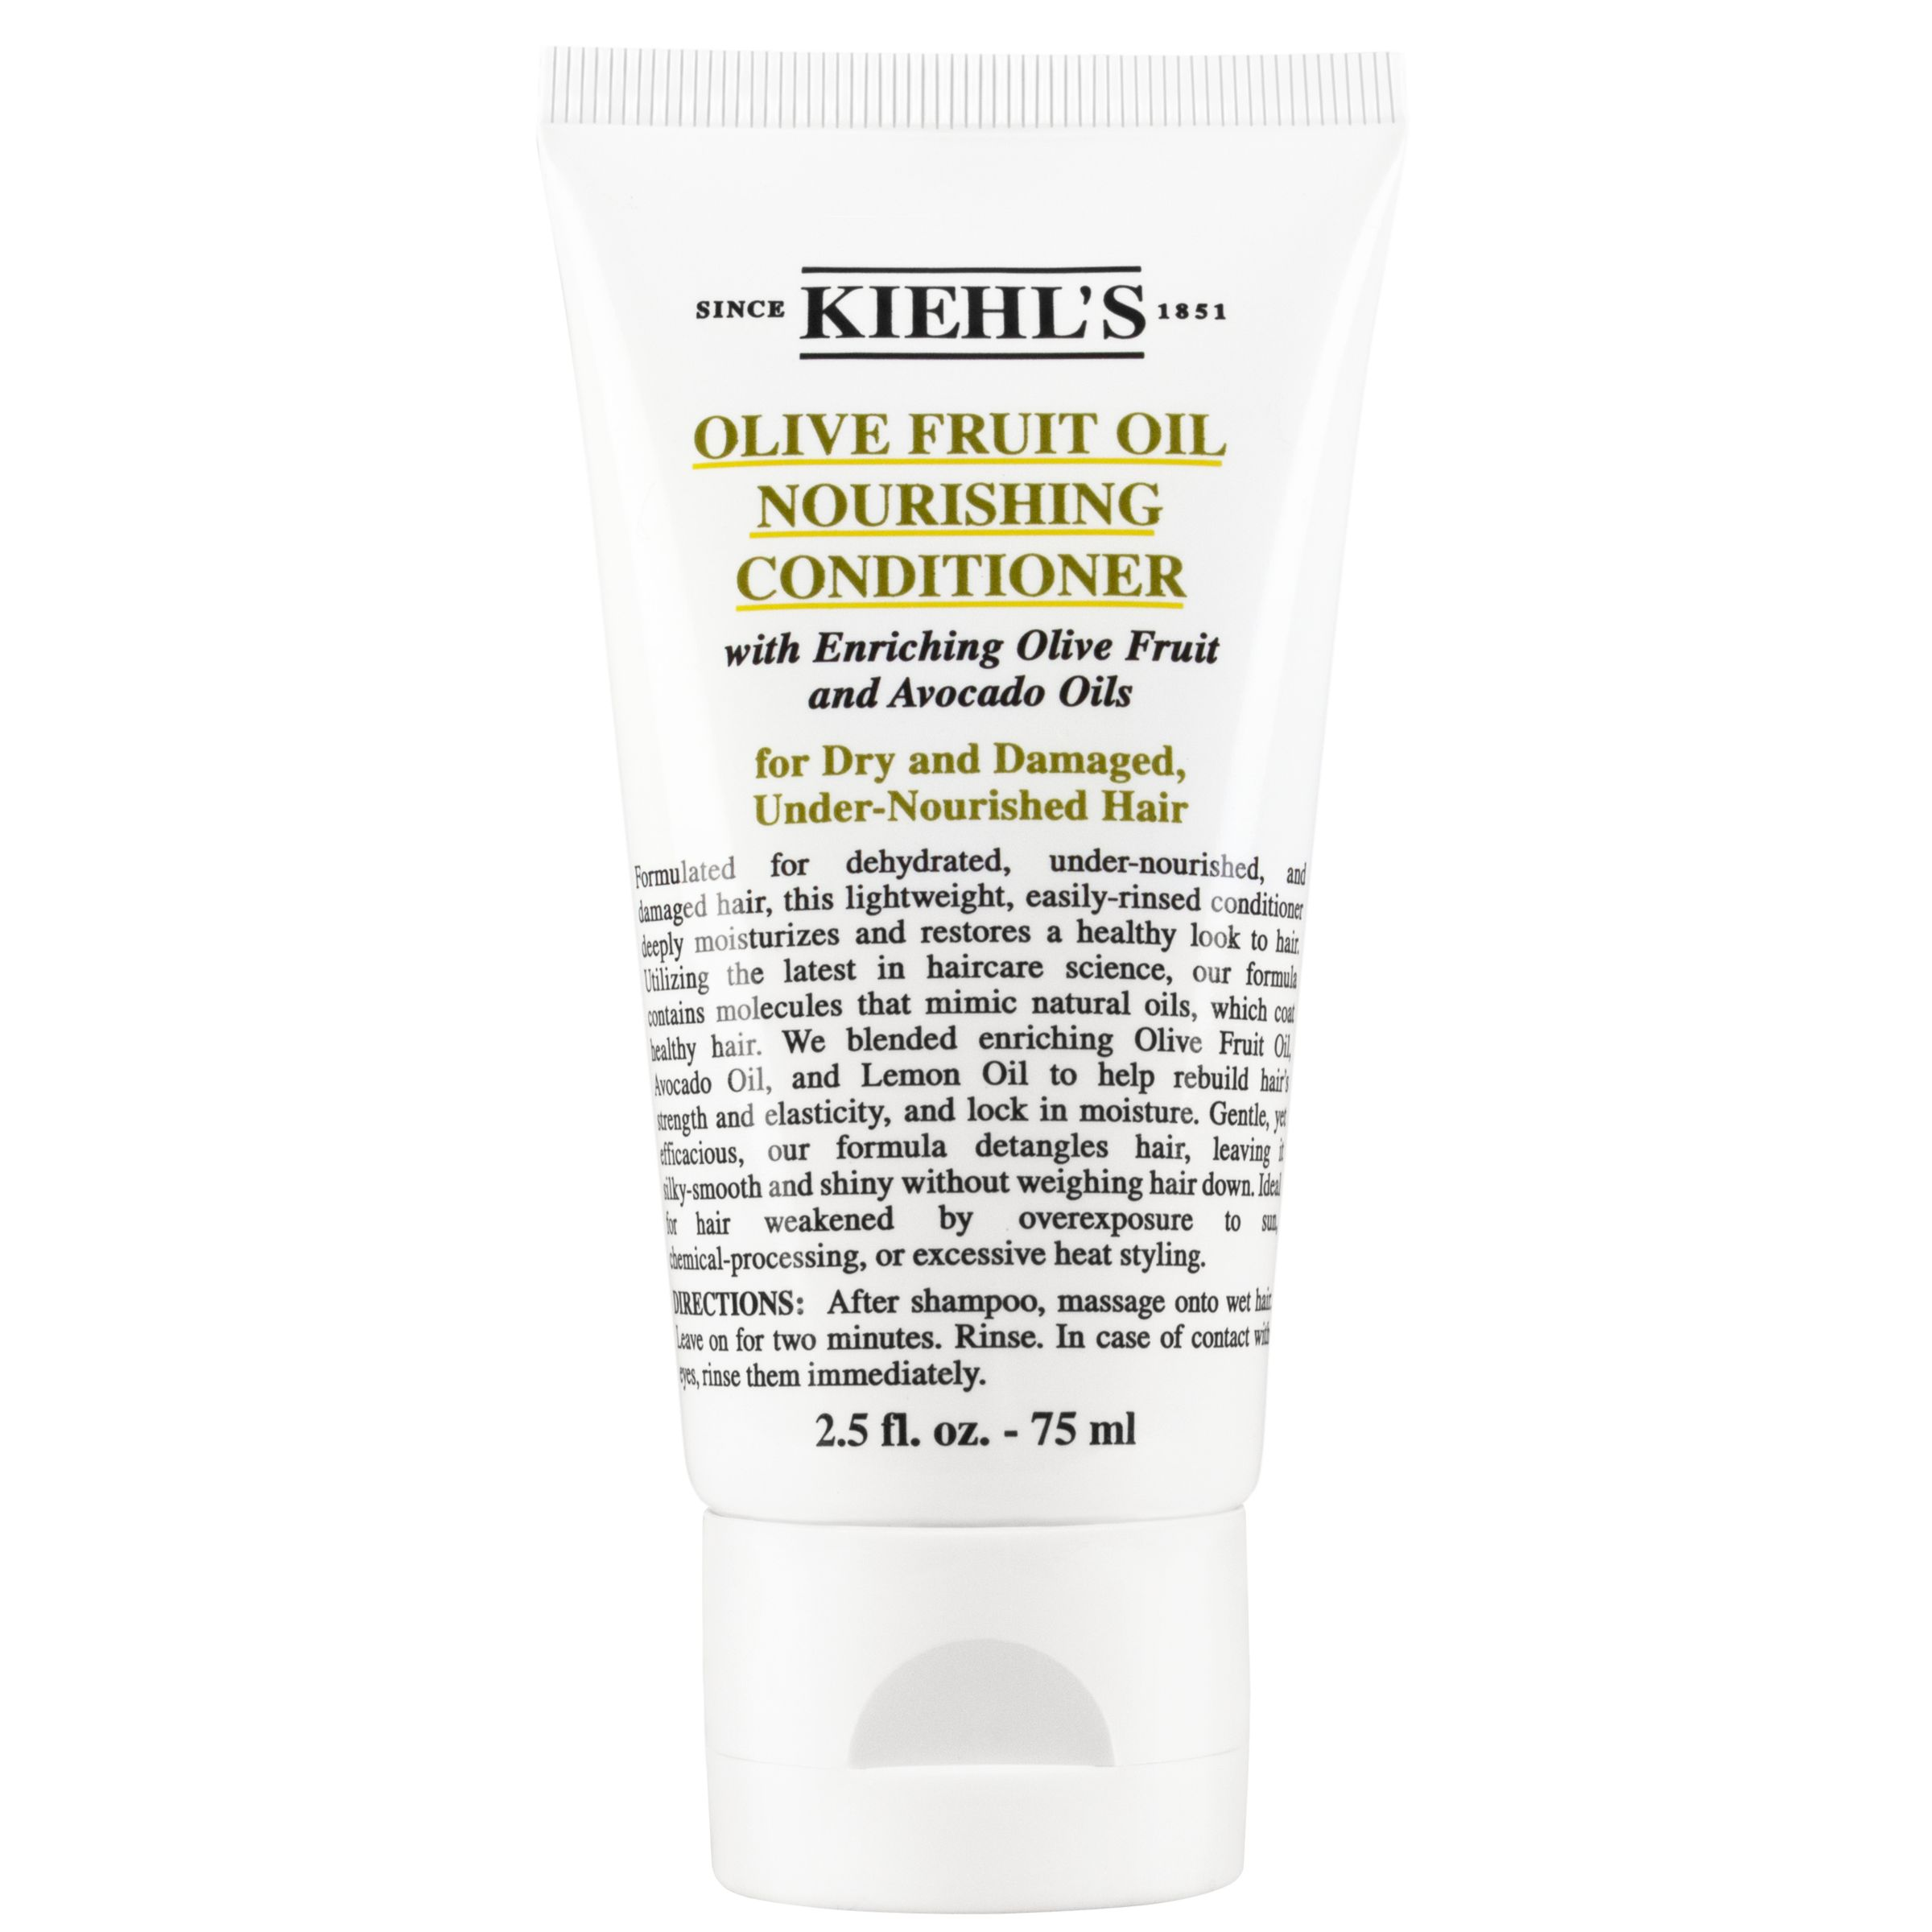 Kiehls Kiehl's Olive Fruit Oil Nourishing Conditioner, 75ml